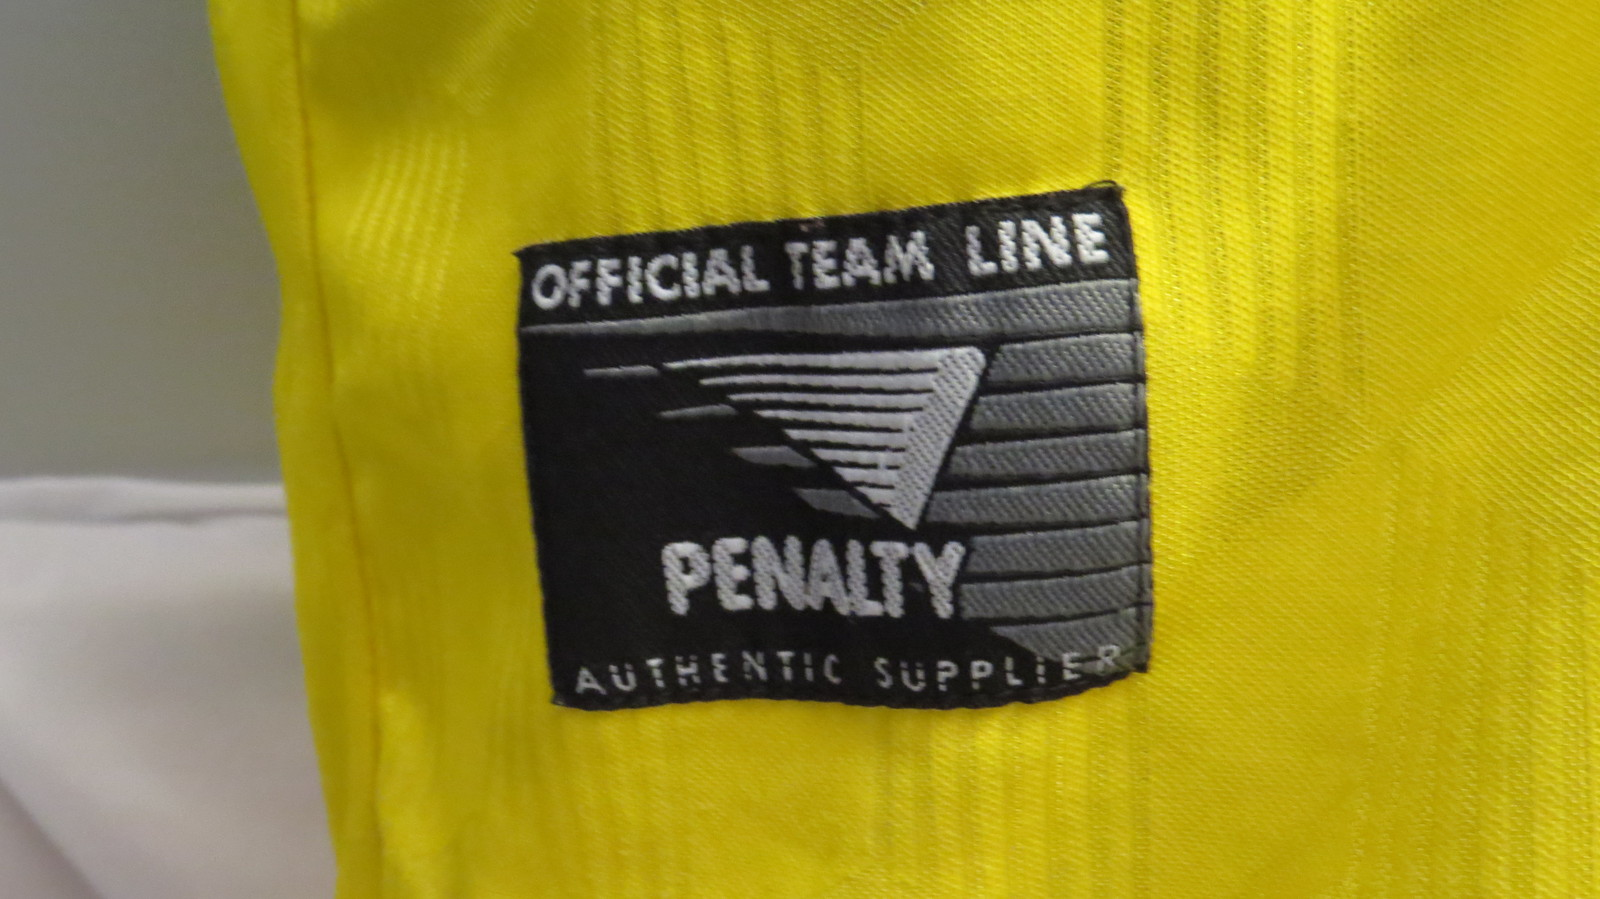 Team Brasil Futsal Jersey (Indoor Soccer) - By Penatly Brazil (VTG)- Mens Large